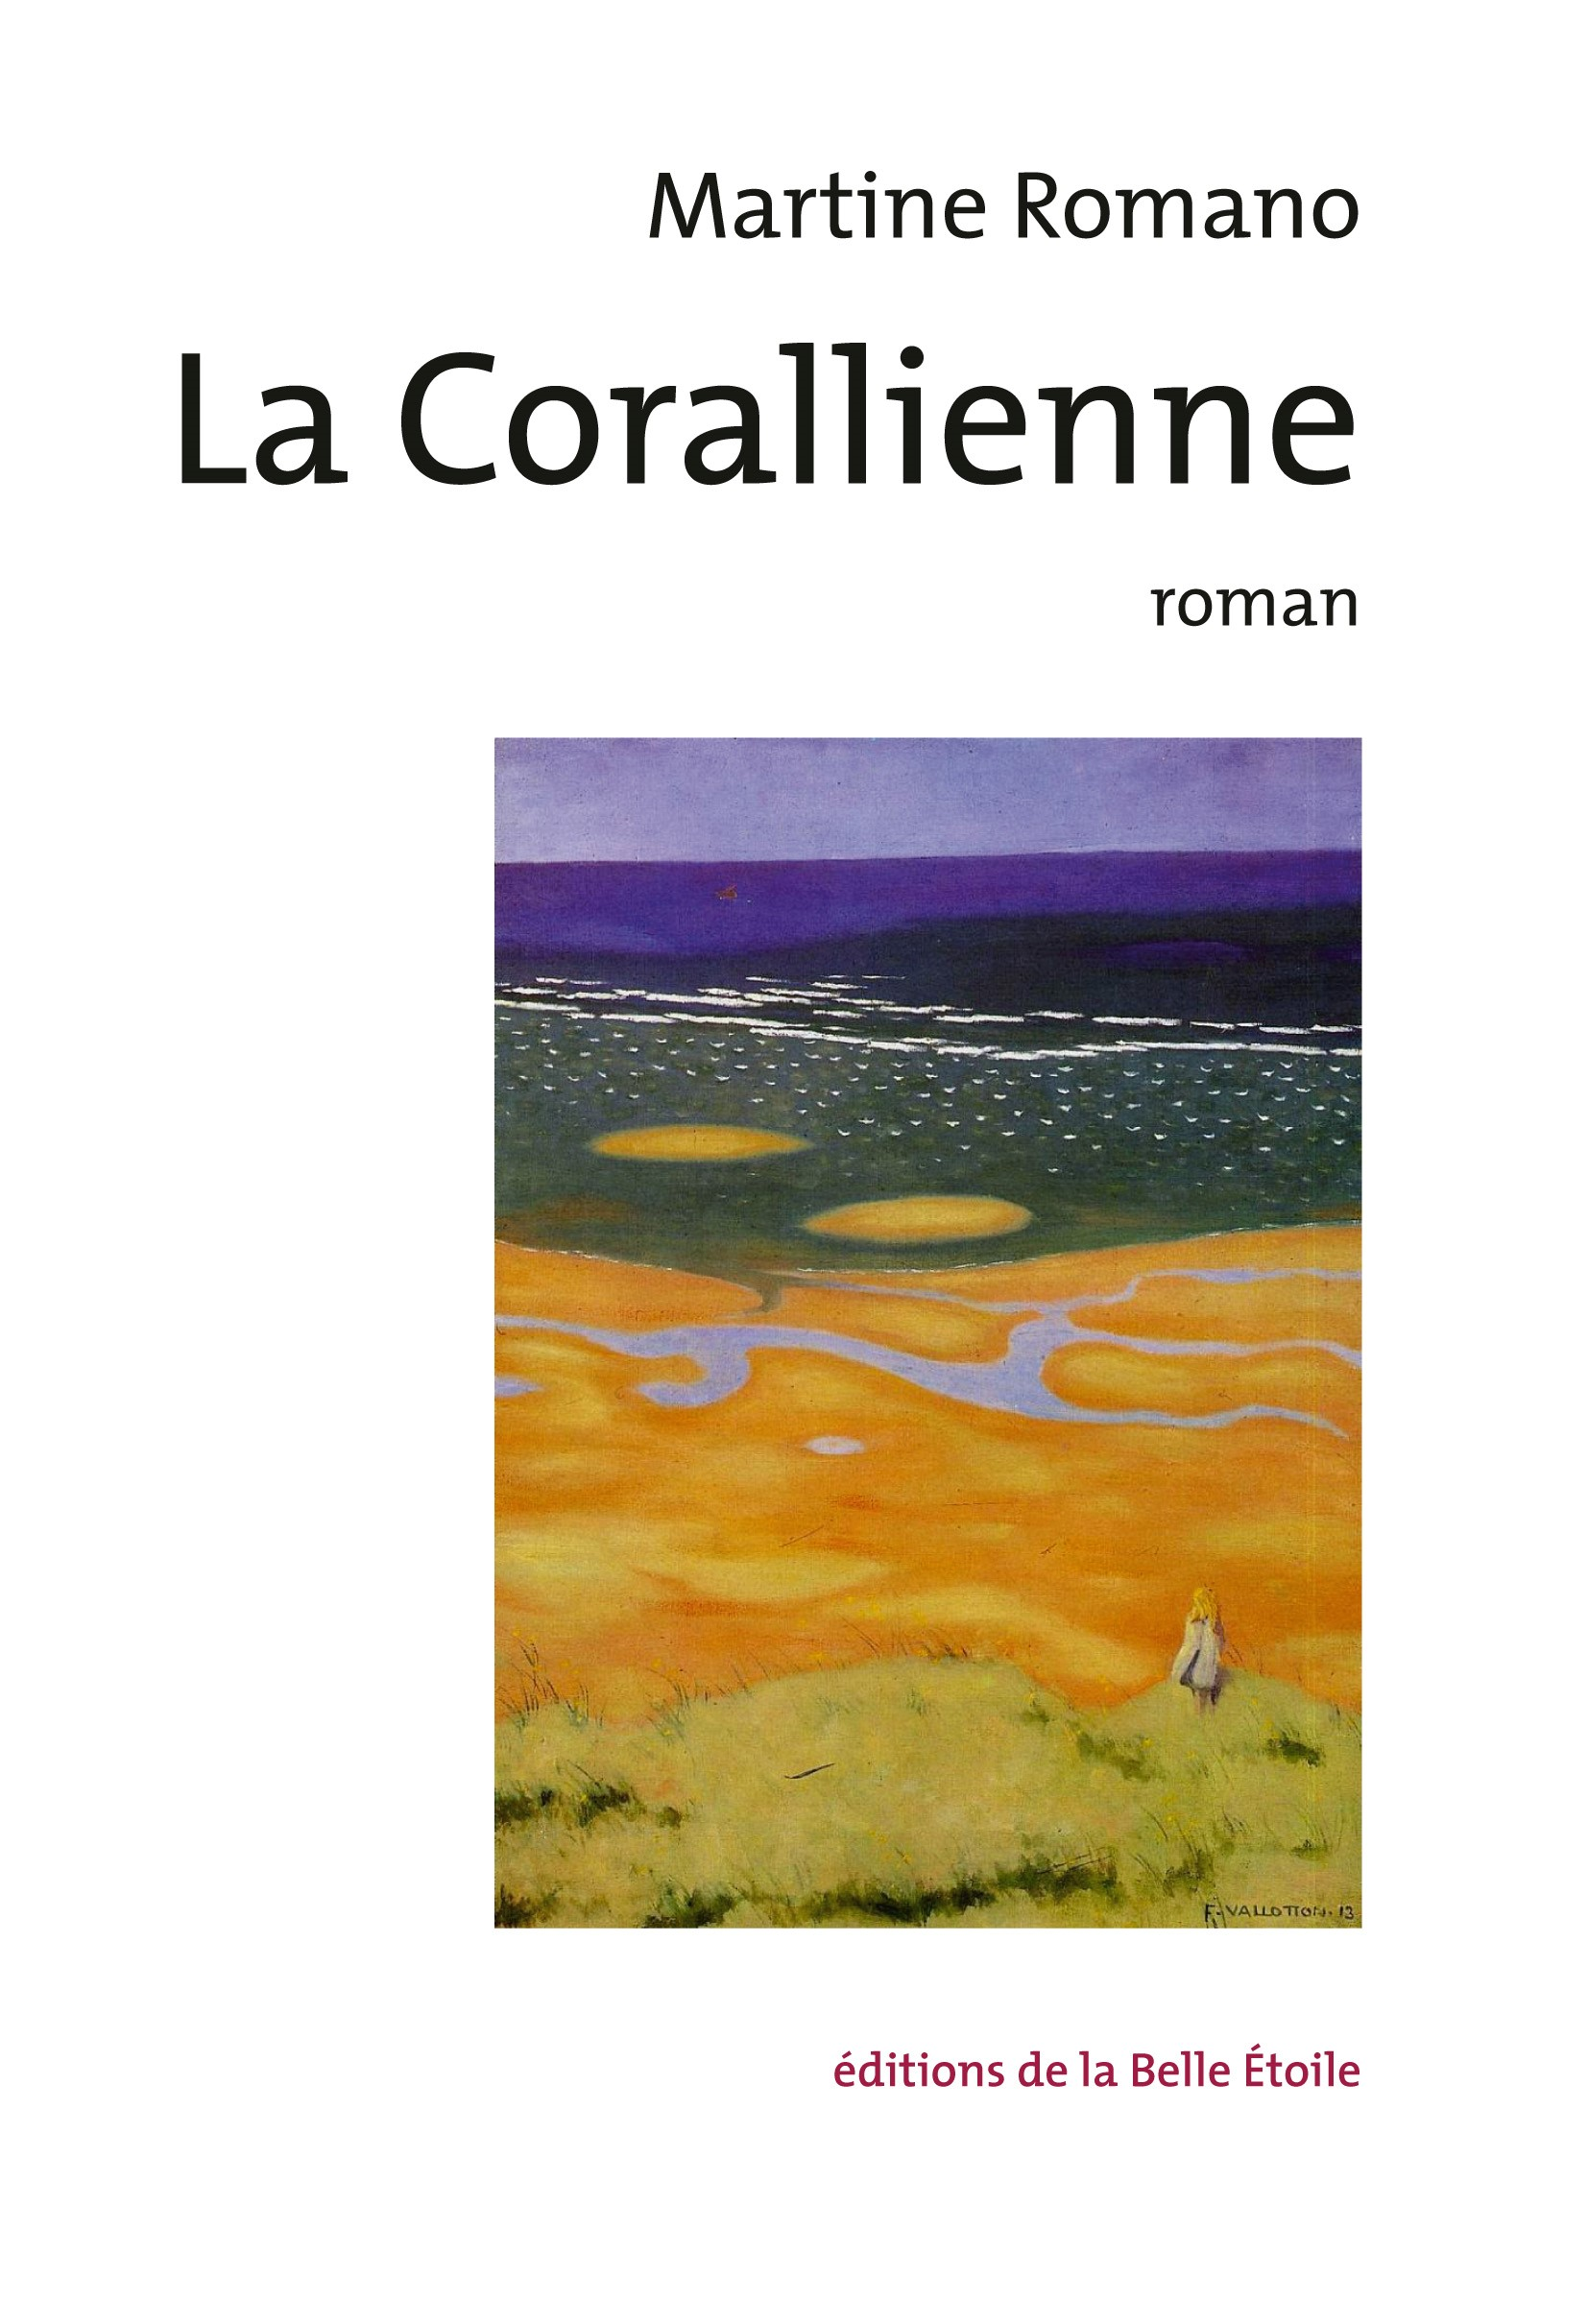 La Corallienne